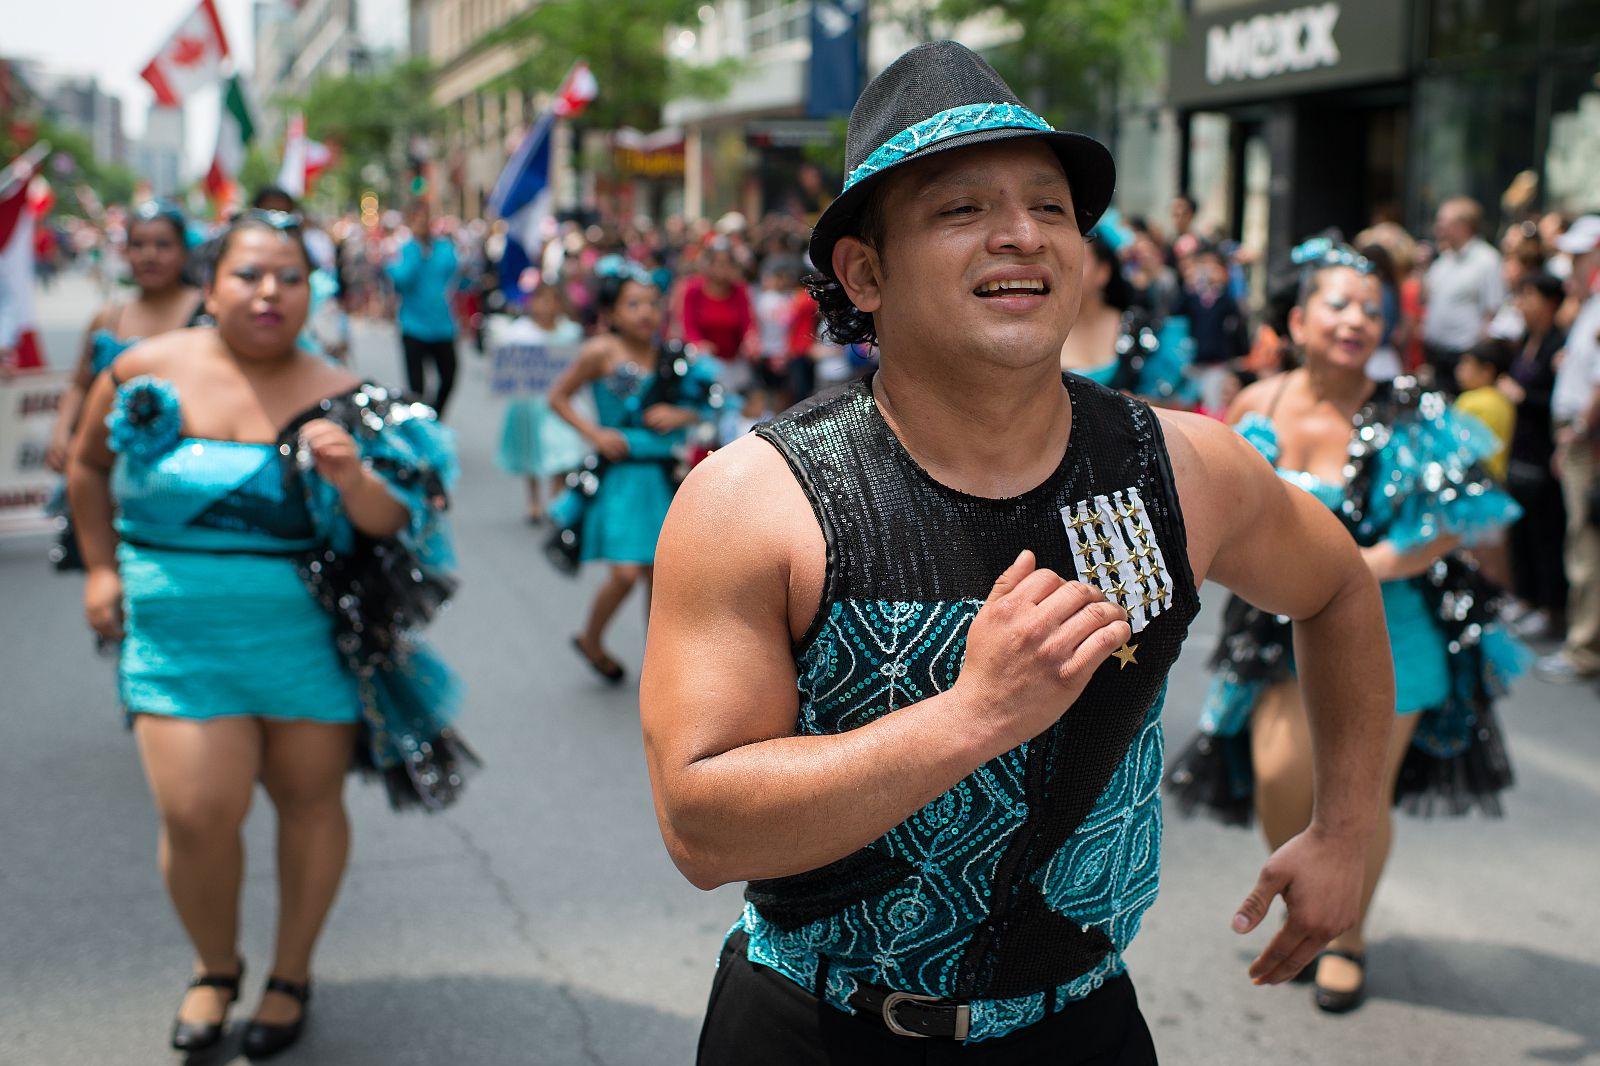 defile noel montreal 2018 Canada Day Parade Montreal 2018: Défilé Fête du Canada defile noel montreal 2018